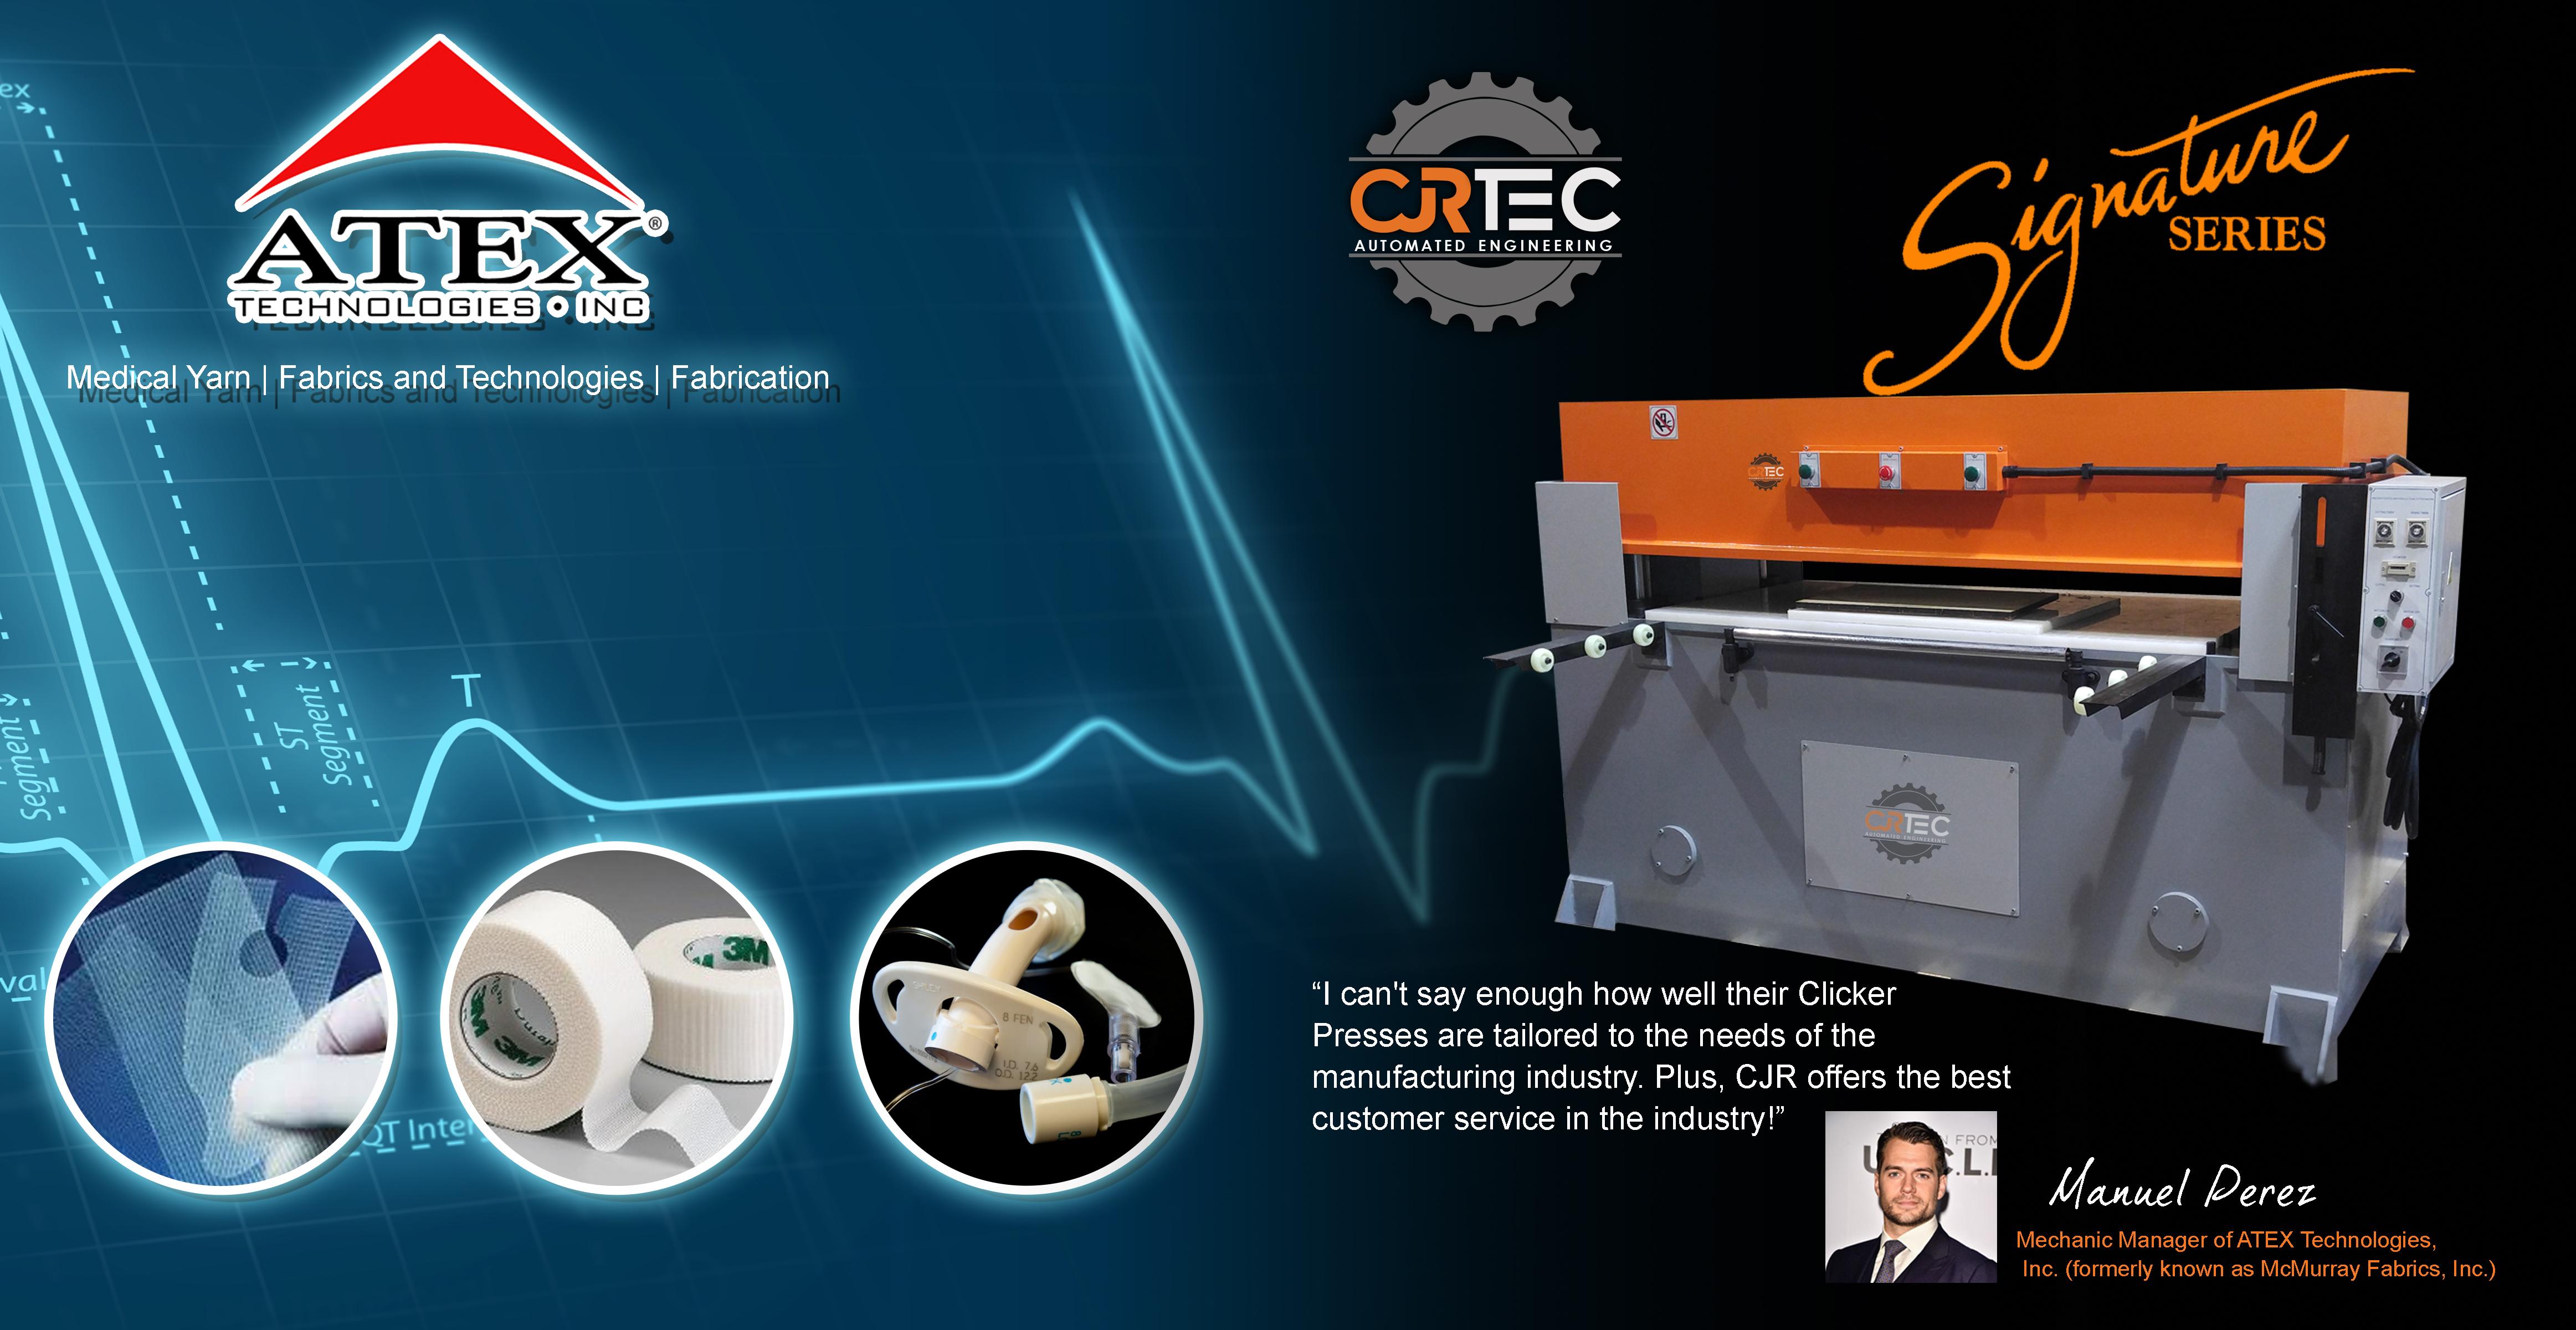 Atex Technologies Inc.